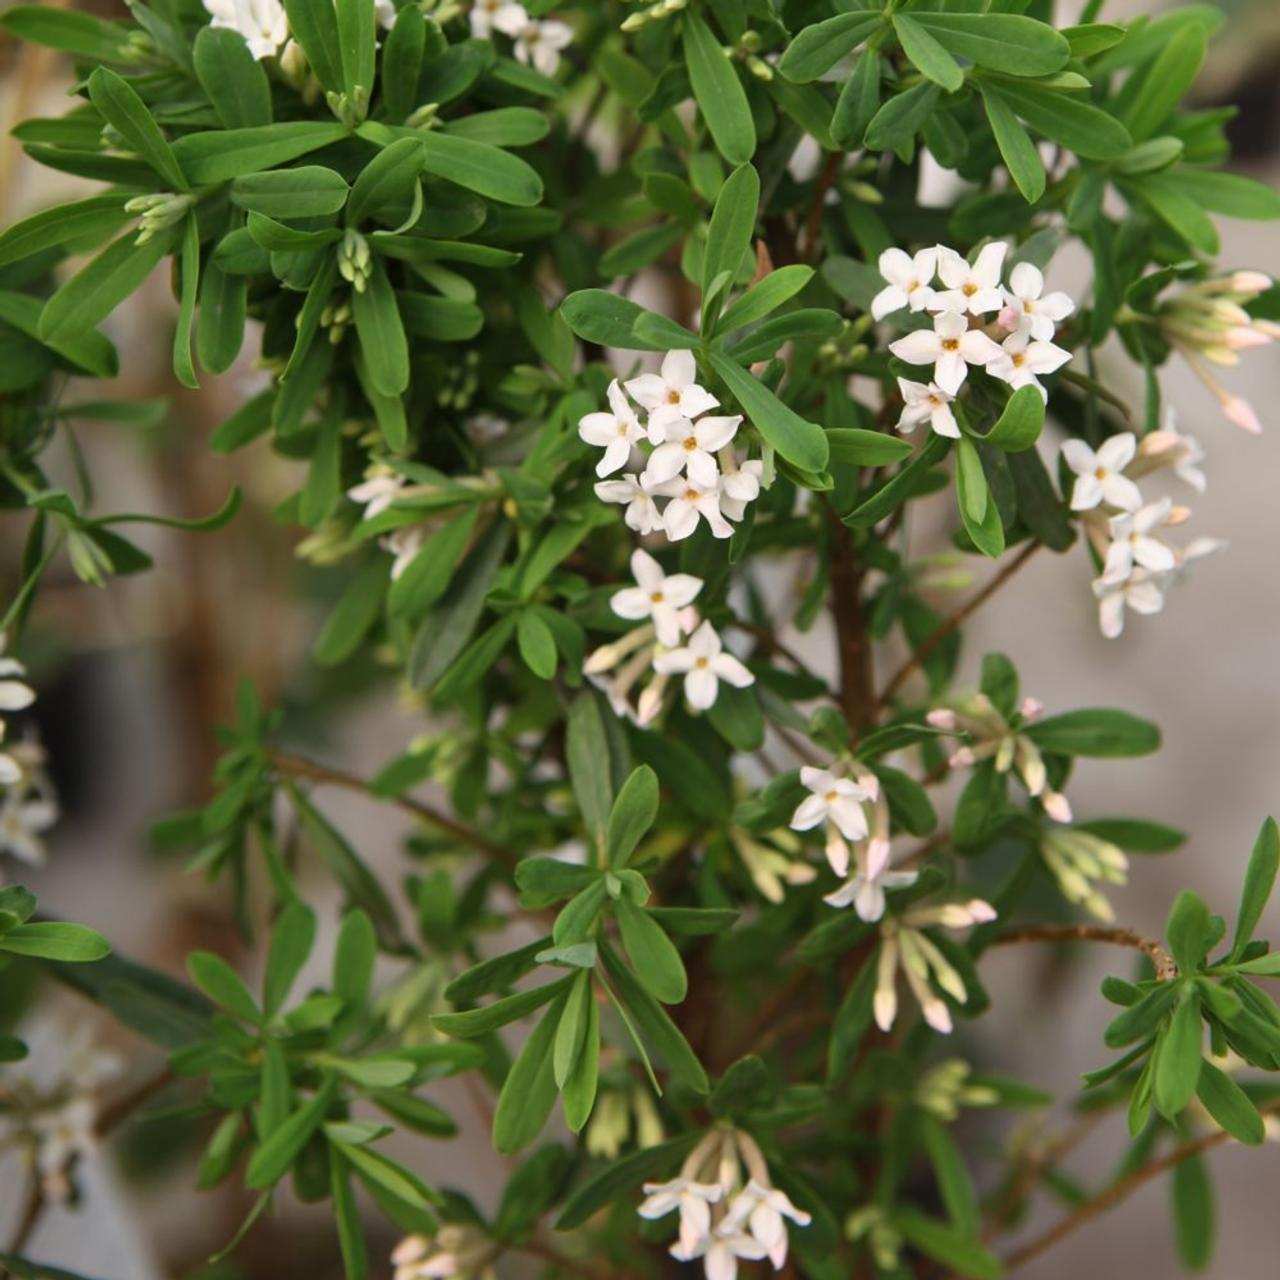 Daphne burkwoodii 'Somerset' plant